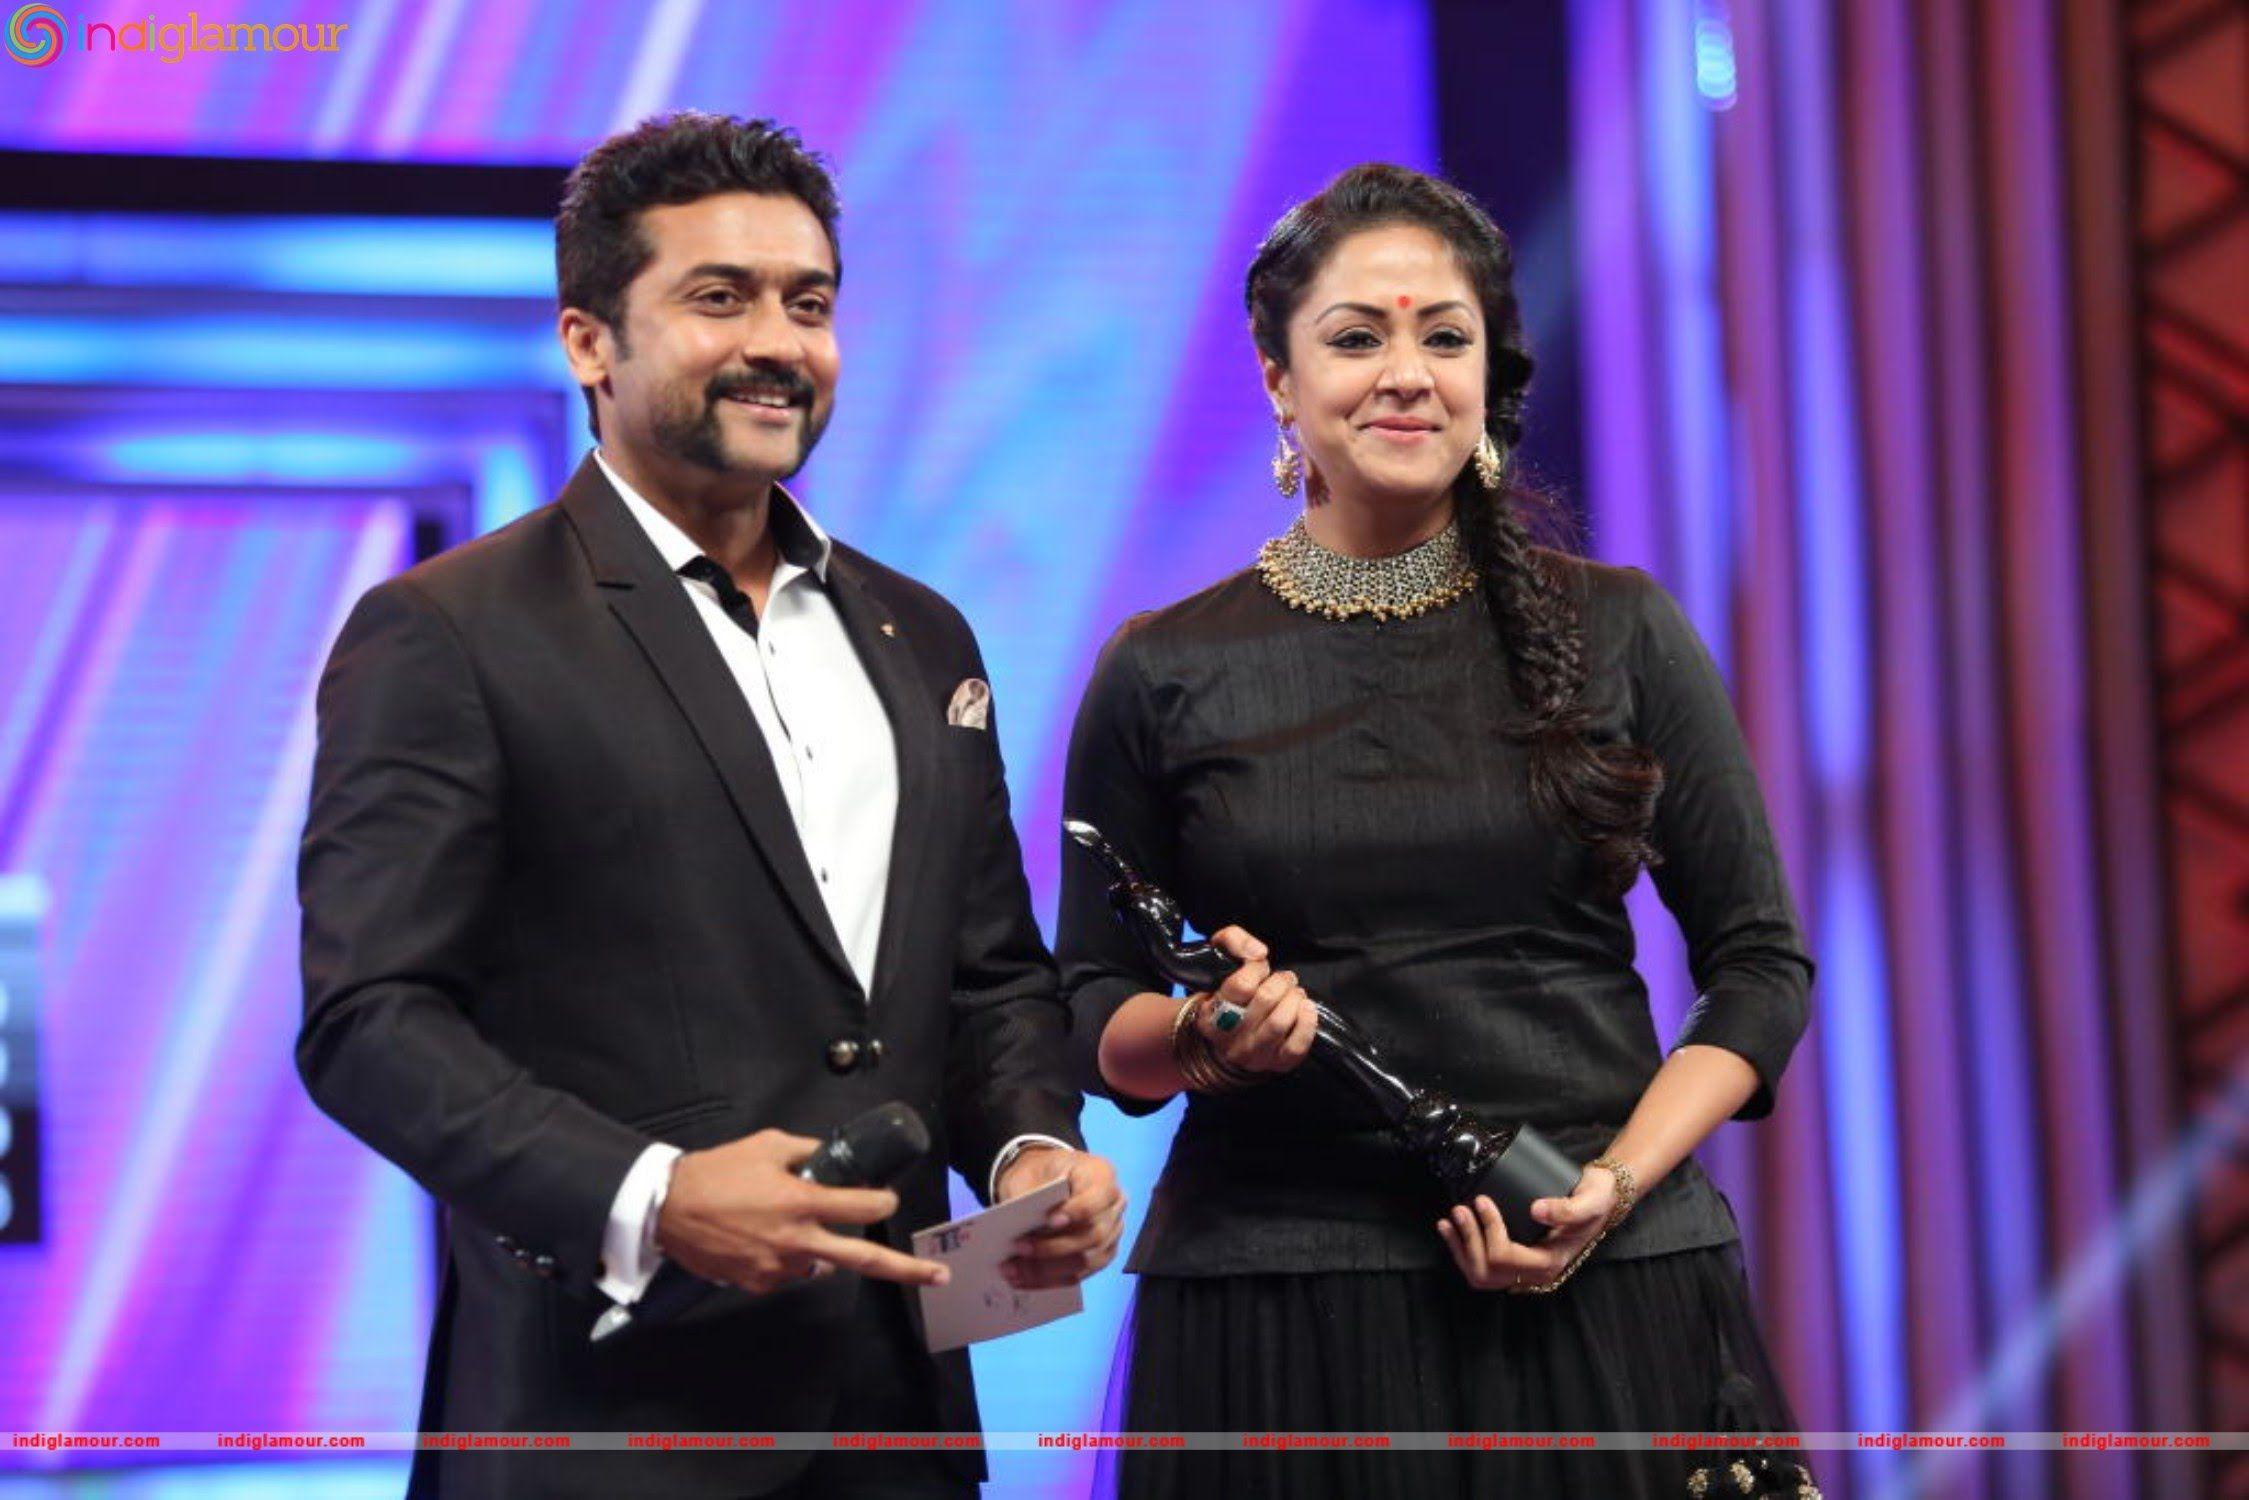 Jyothika Mehndi Ceremony : Surya jyothika in filmfare 2016 best actress award to his wife